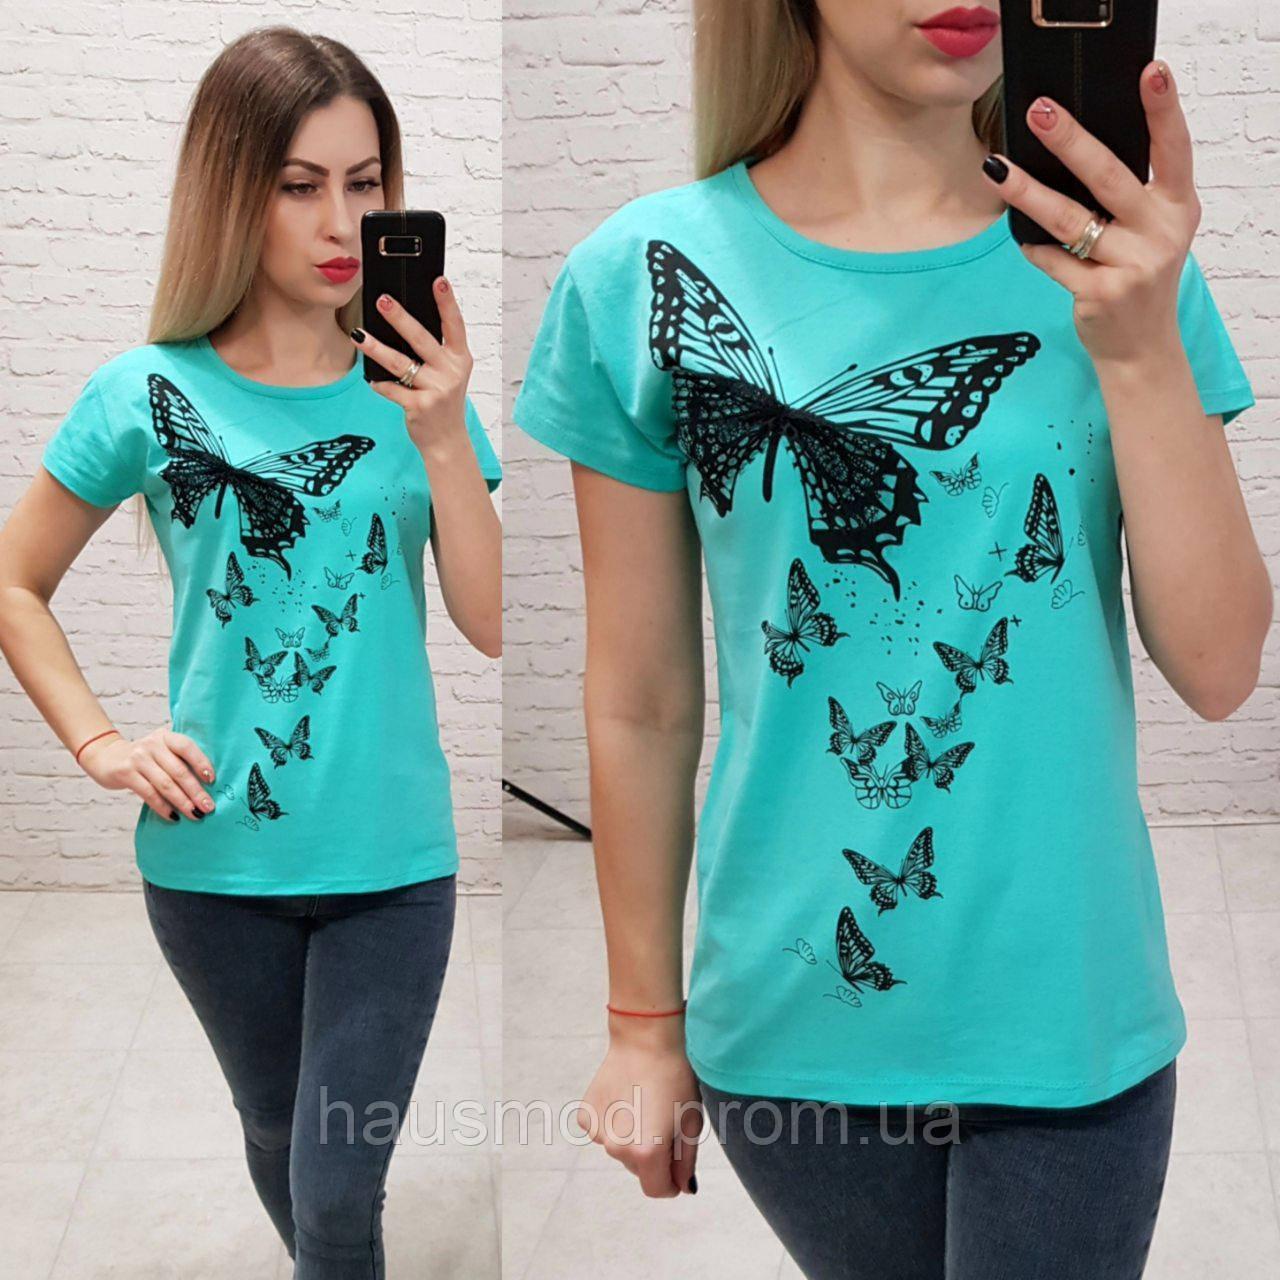 Женская футболка 100% катон бабочки Турция голубая